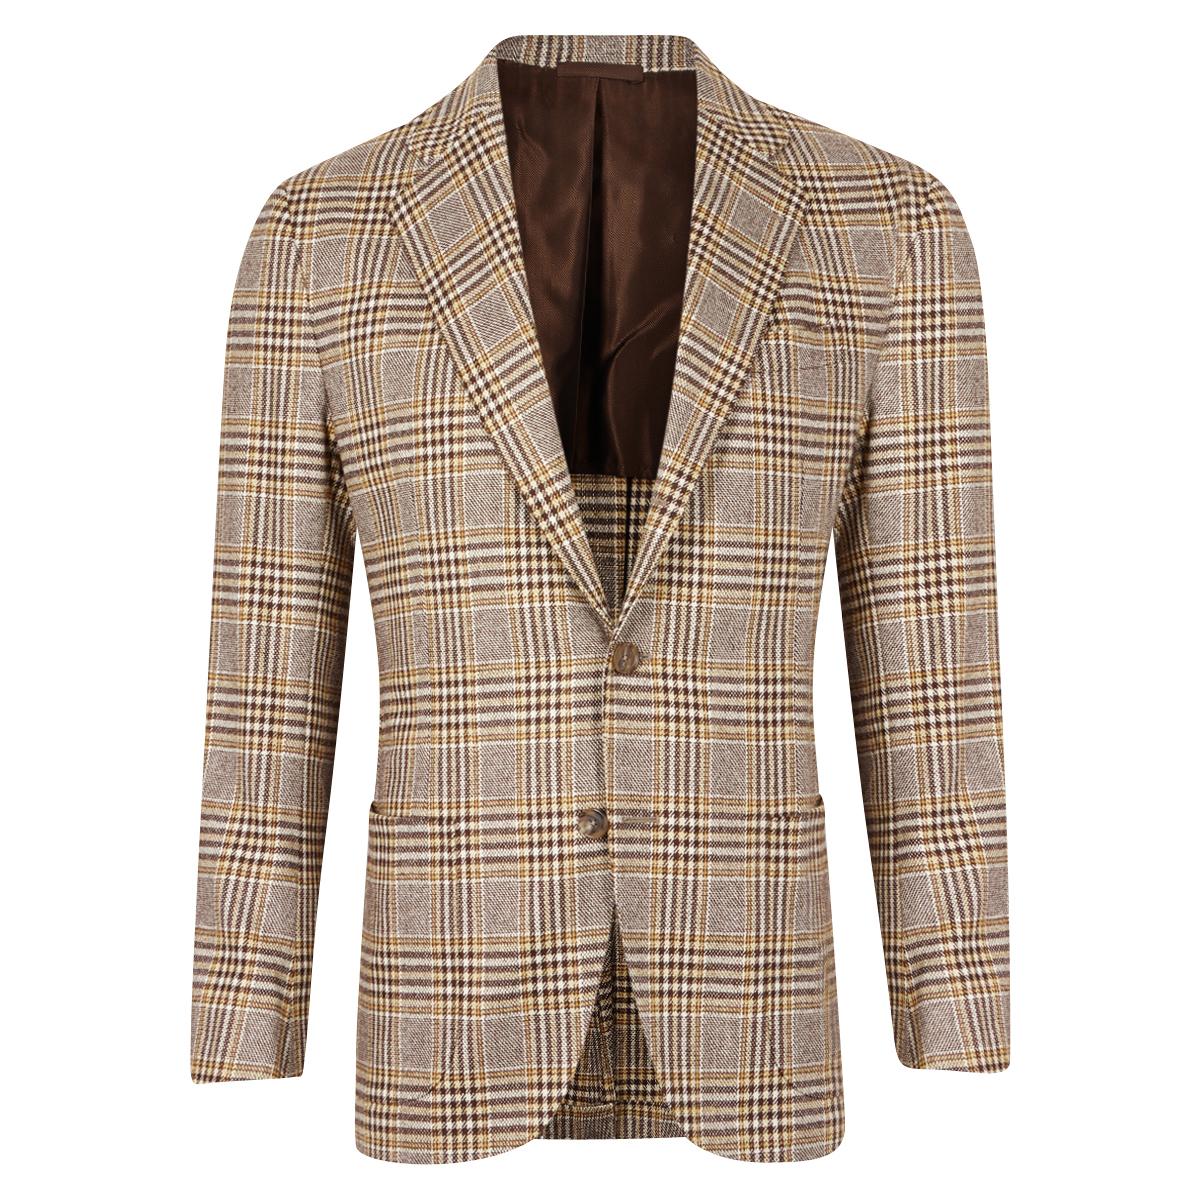 Brown And Beige Prince Of Wales Jacket